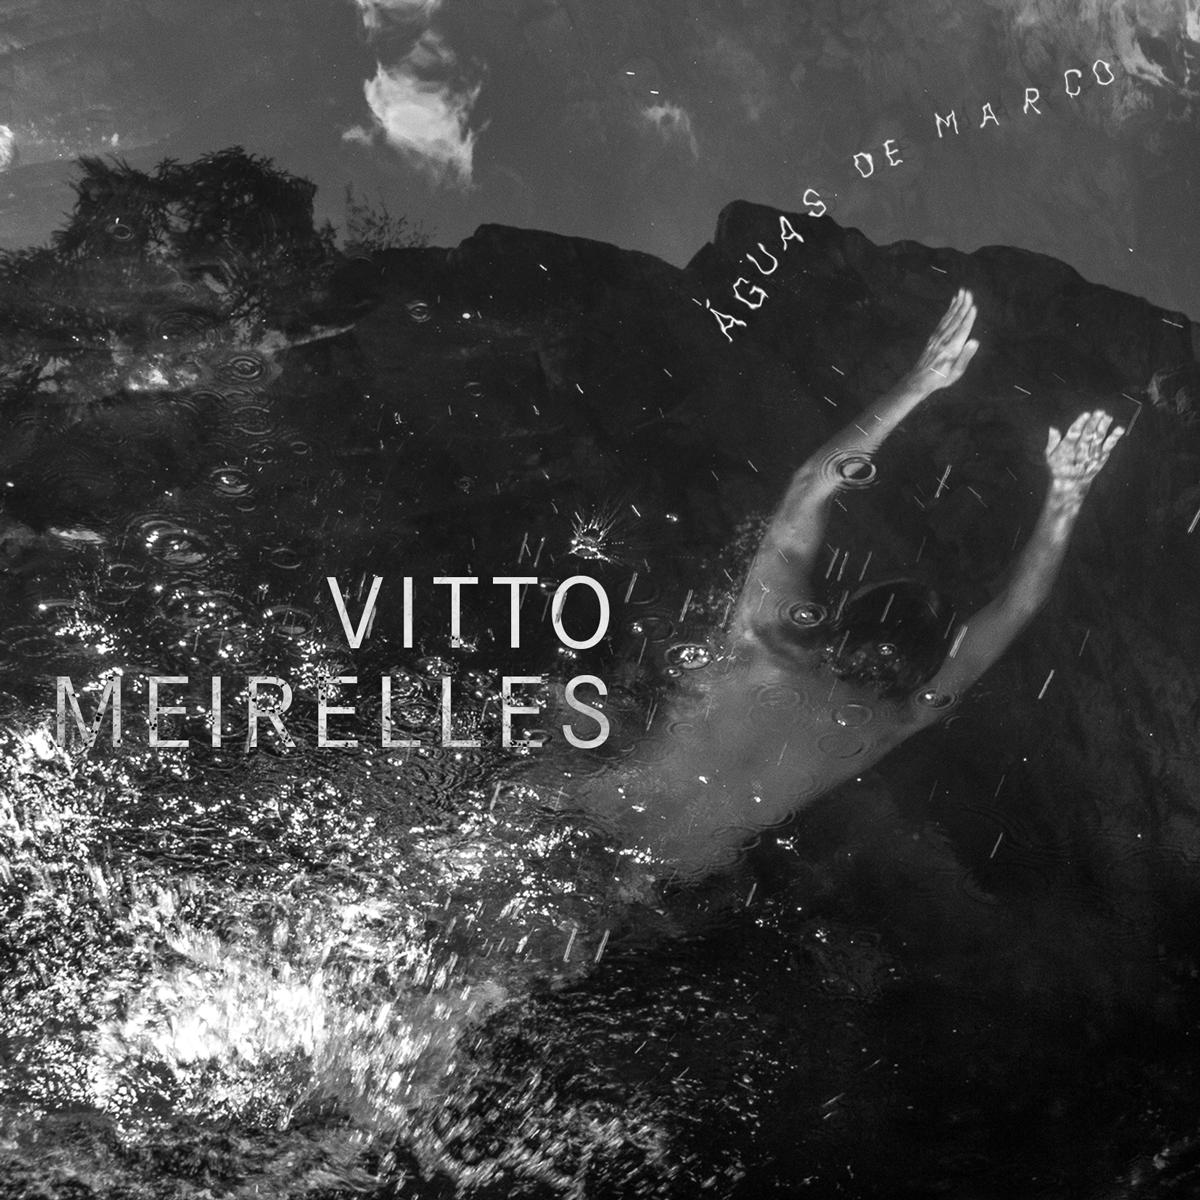 Vitto_aguasdemarco